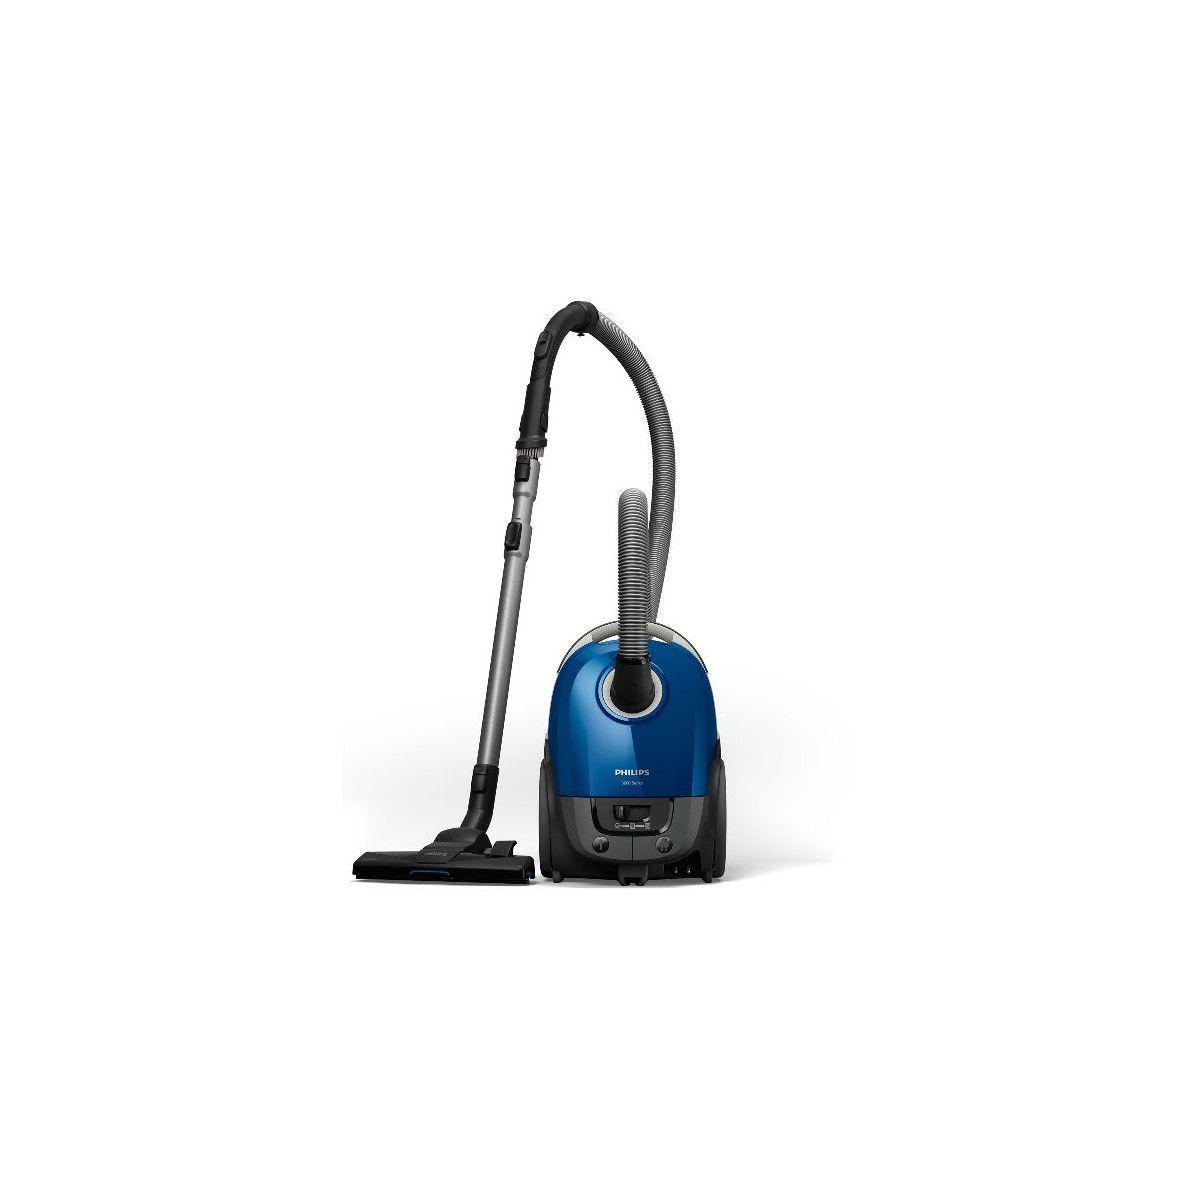 Philips Aspirateur Sac 900w Brosse Tri Active Bleu Philips - Xd3110.09